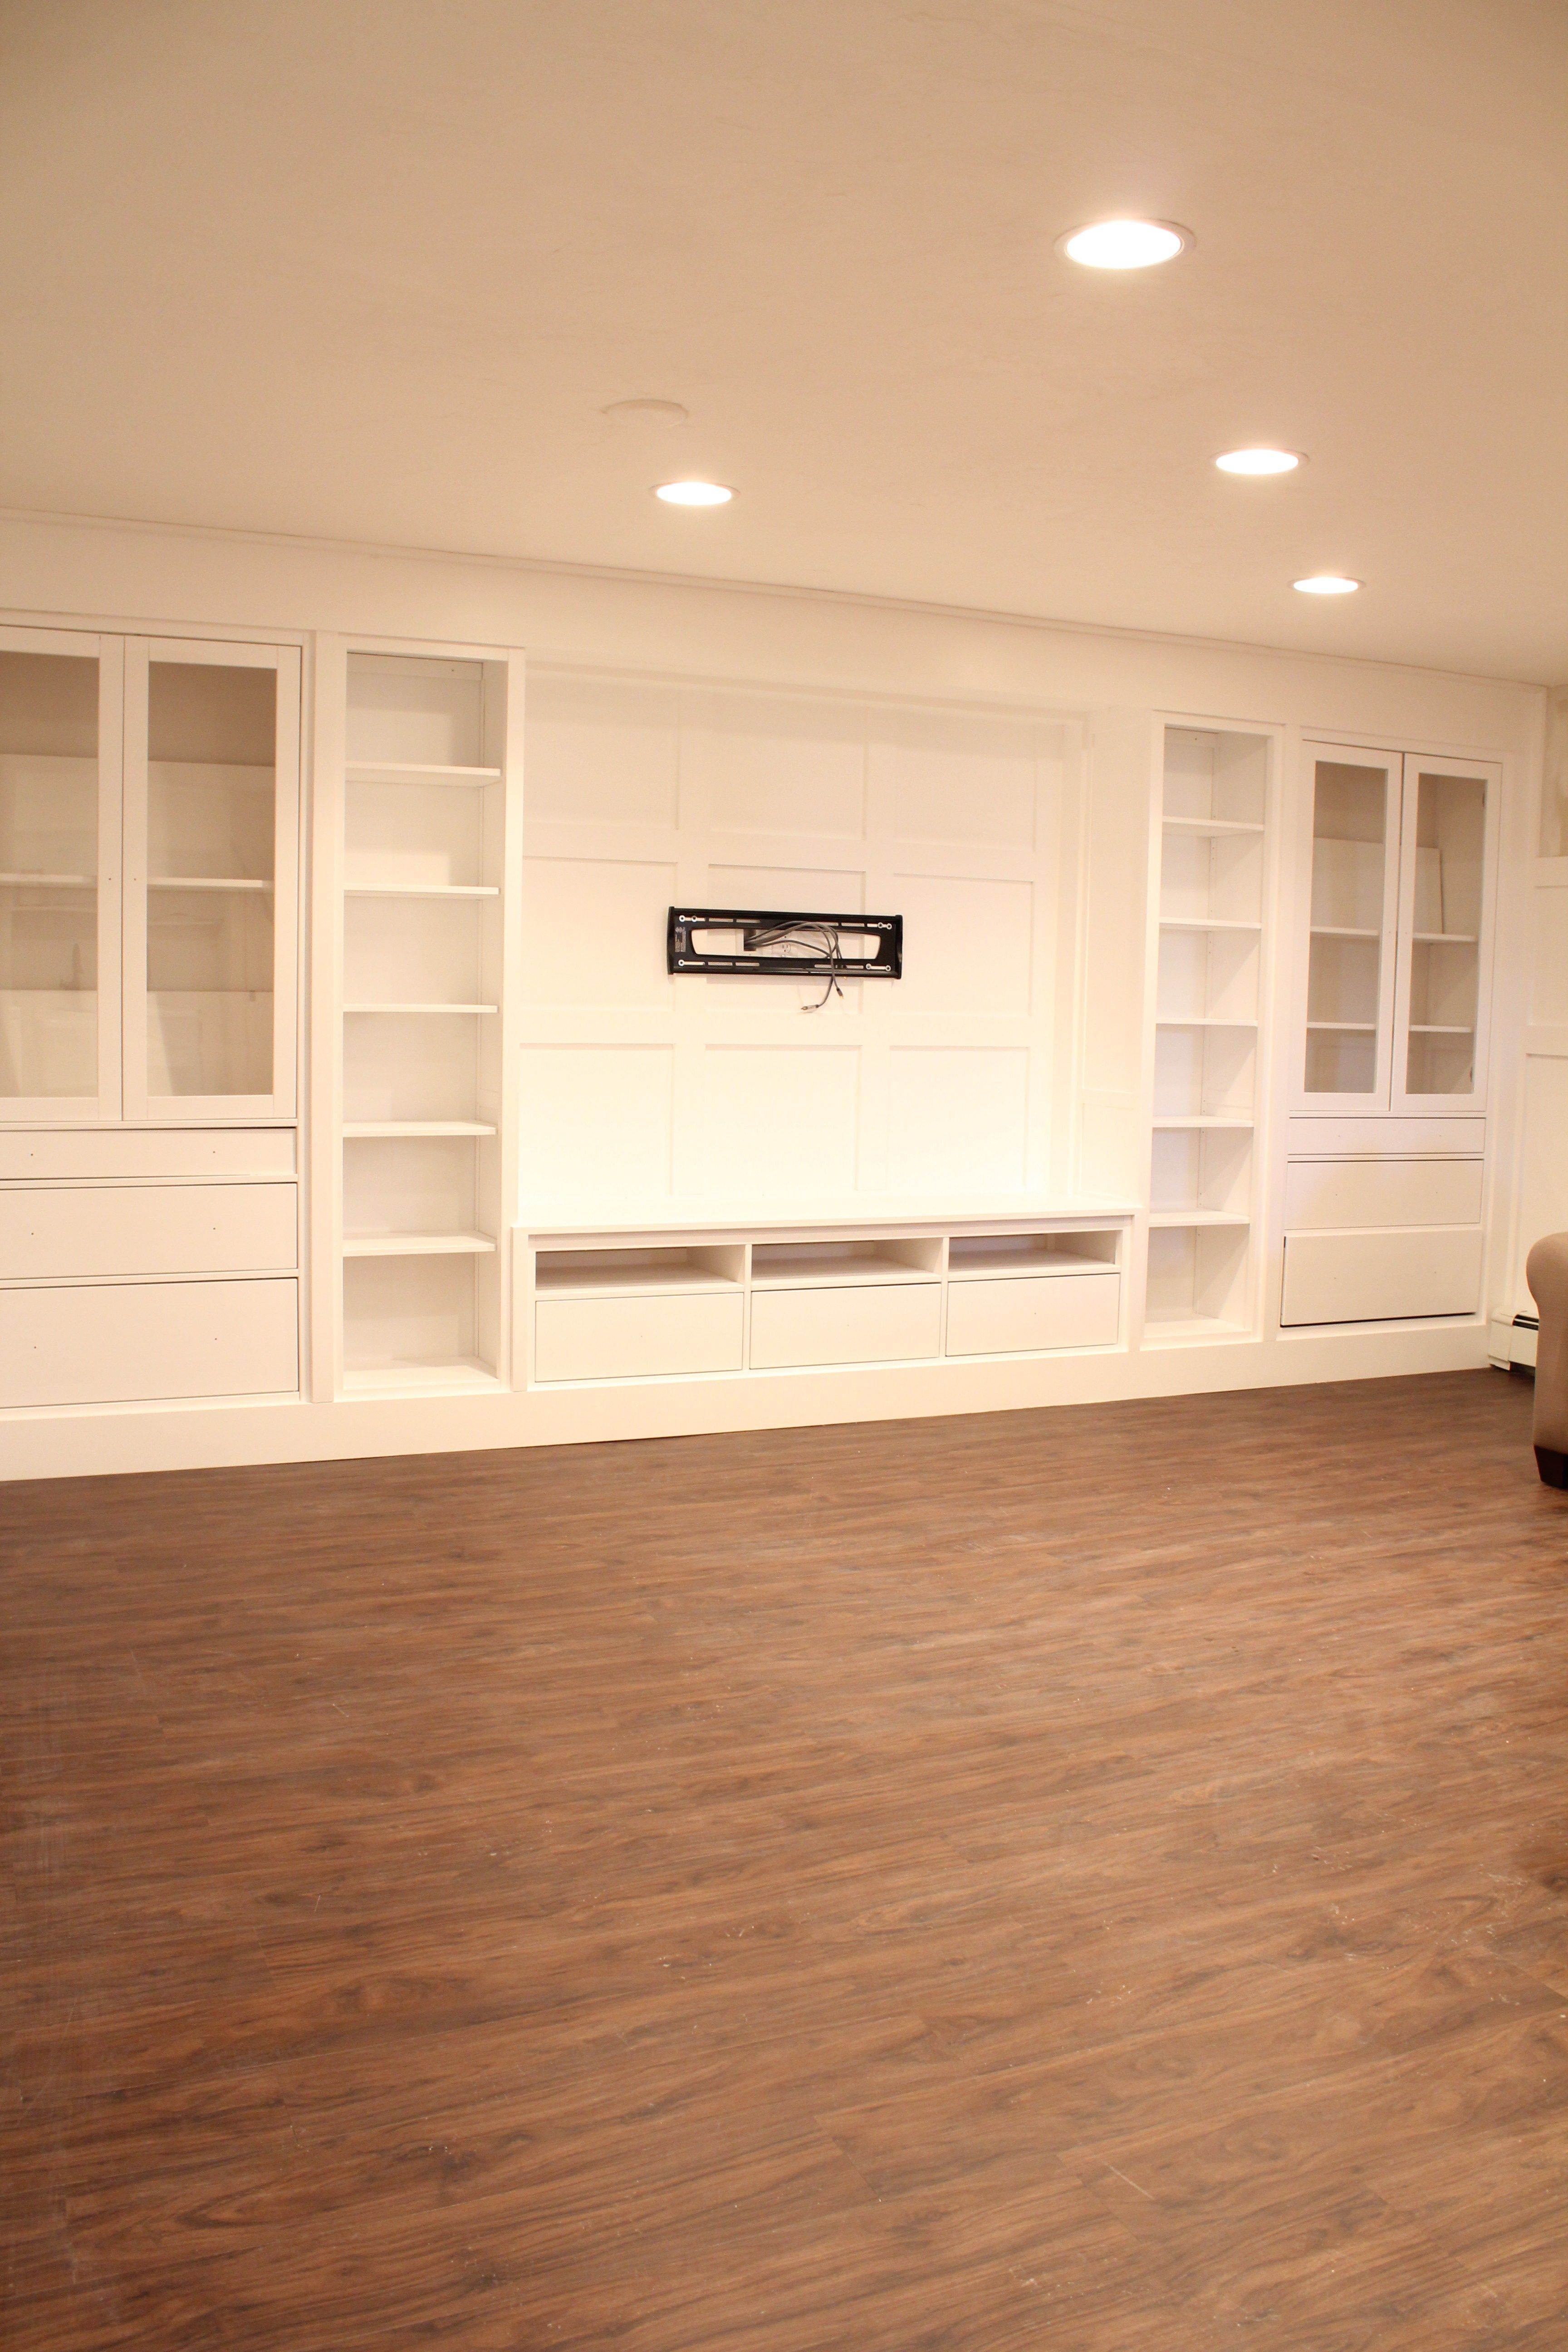 vinyl plank flooring home house re do basement house family room walls basement floor. Black Bedroom Furniture Sets. Home Design Ideas